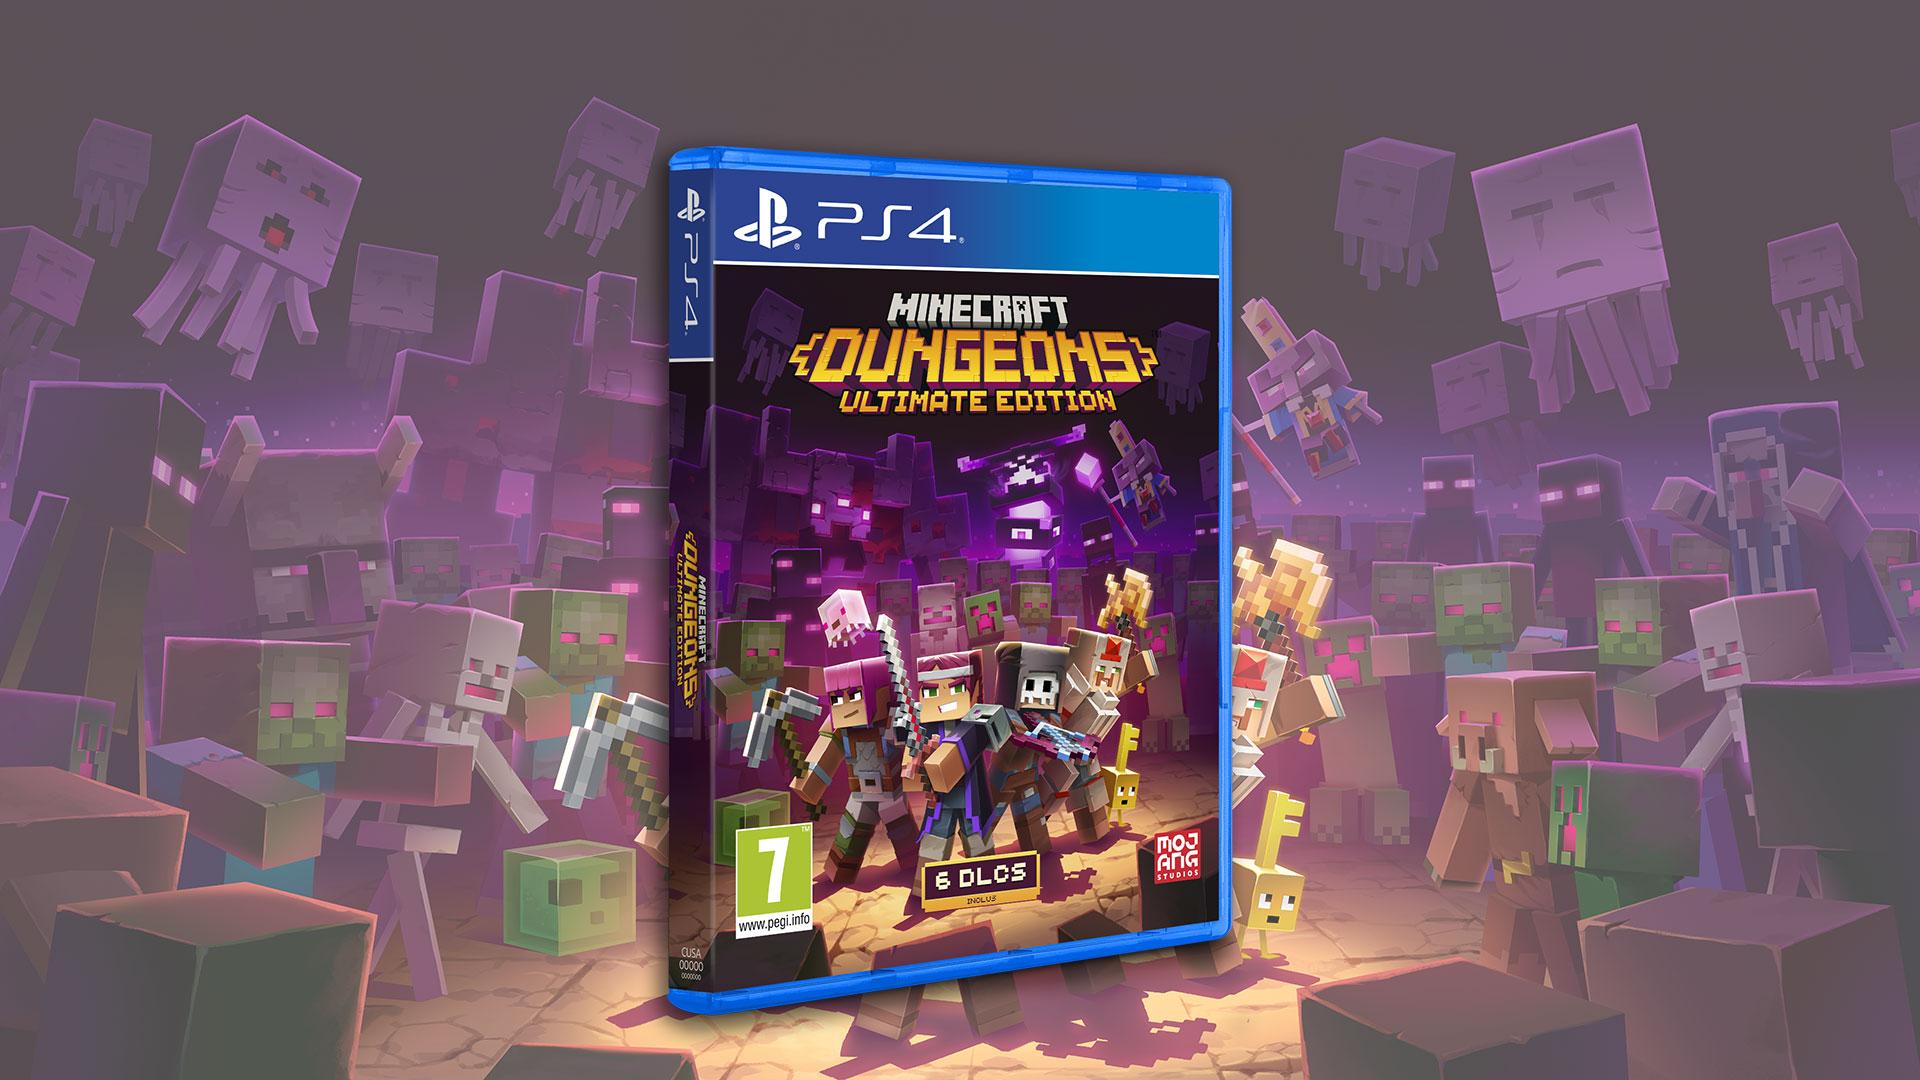 Minecraft-Dungeons-Ultimate-Edition-packshot